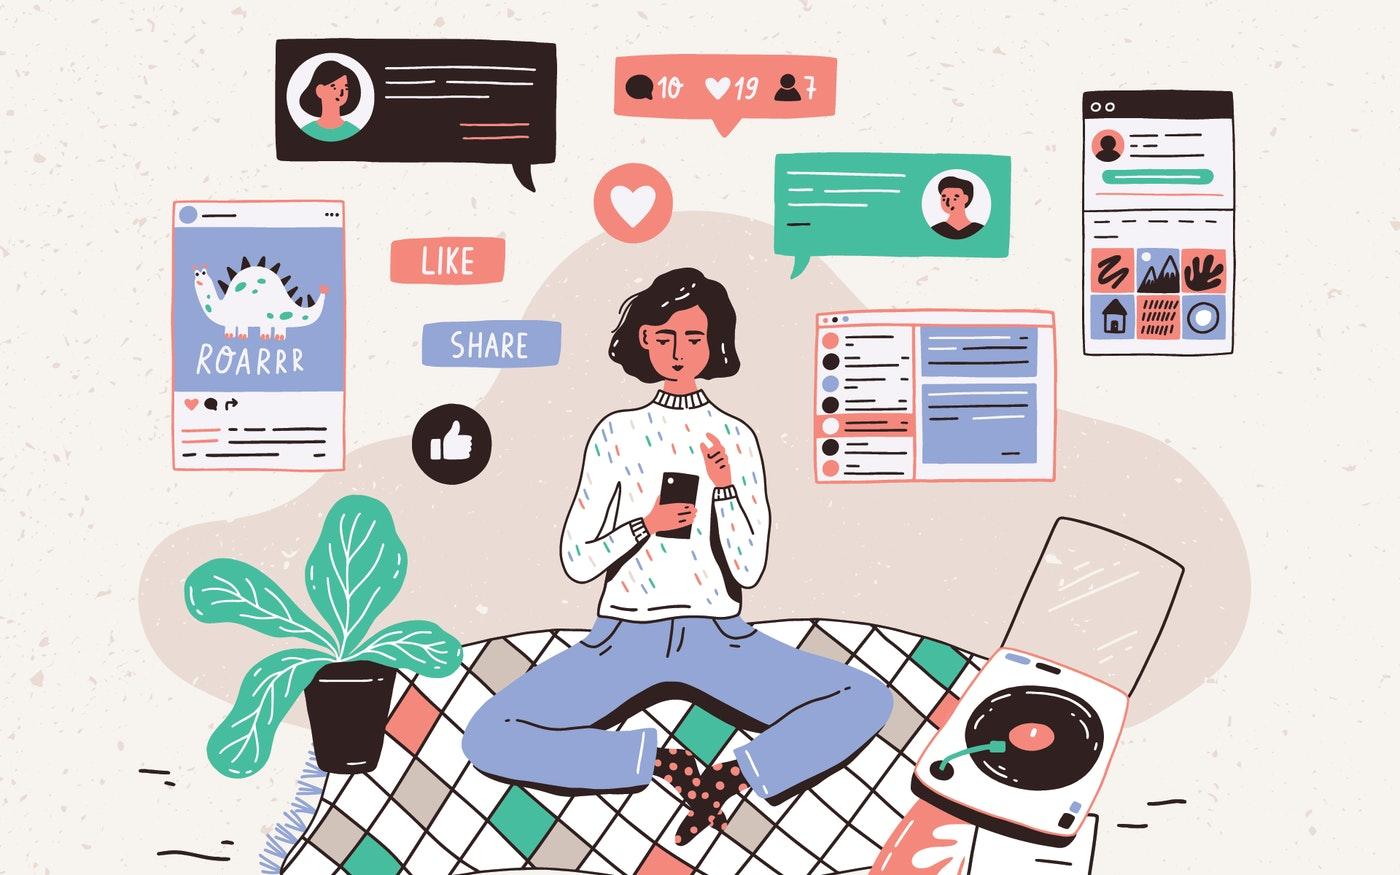 Tak Bisa Lepas dari Media Sosial? Awas Kena Sindrom FOMO! - Good Doctor | Tips Kesehatan, Chat Dokter, Beli Obat Online